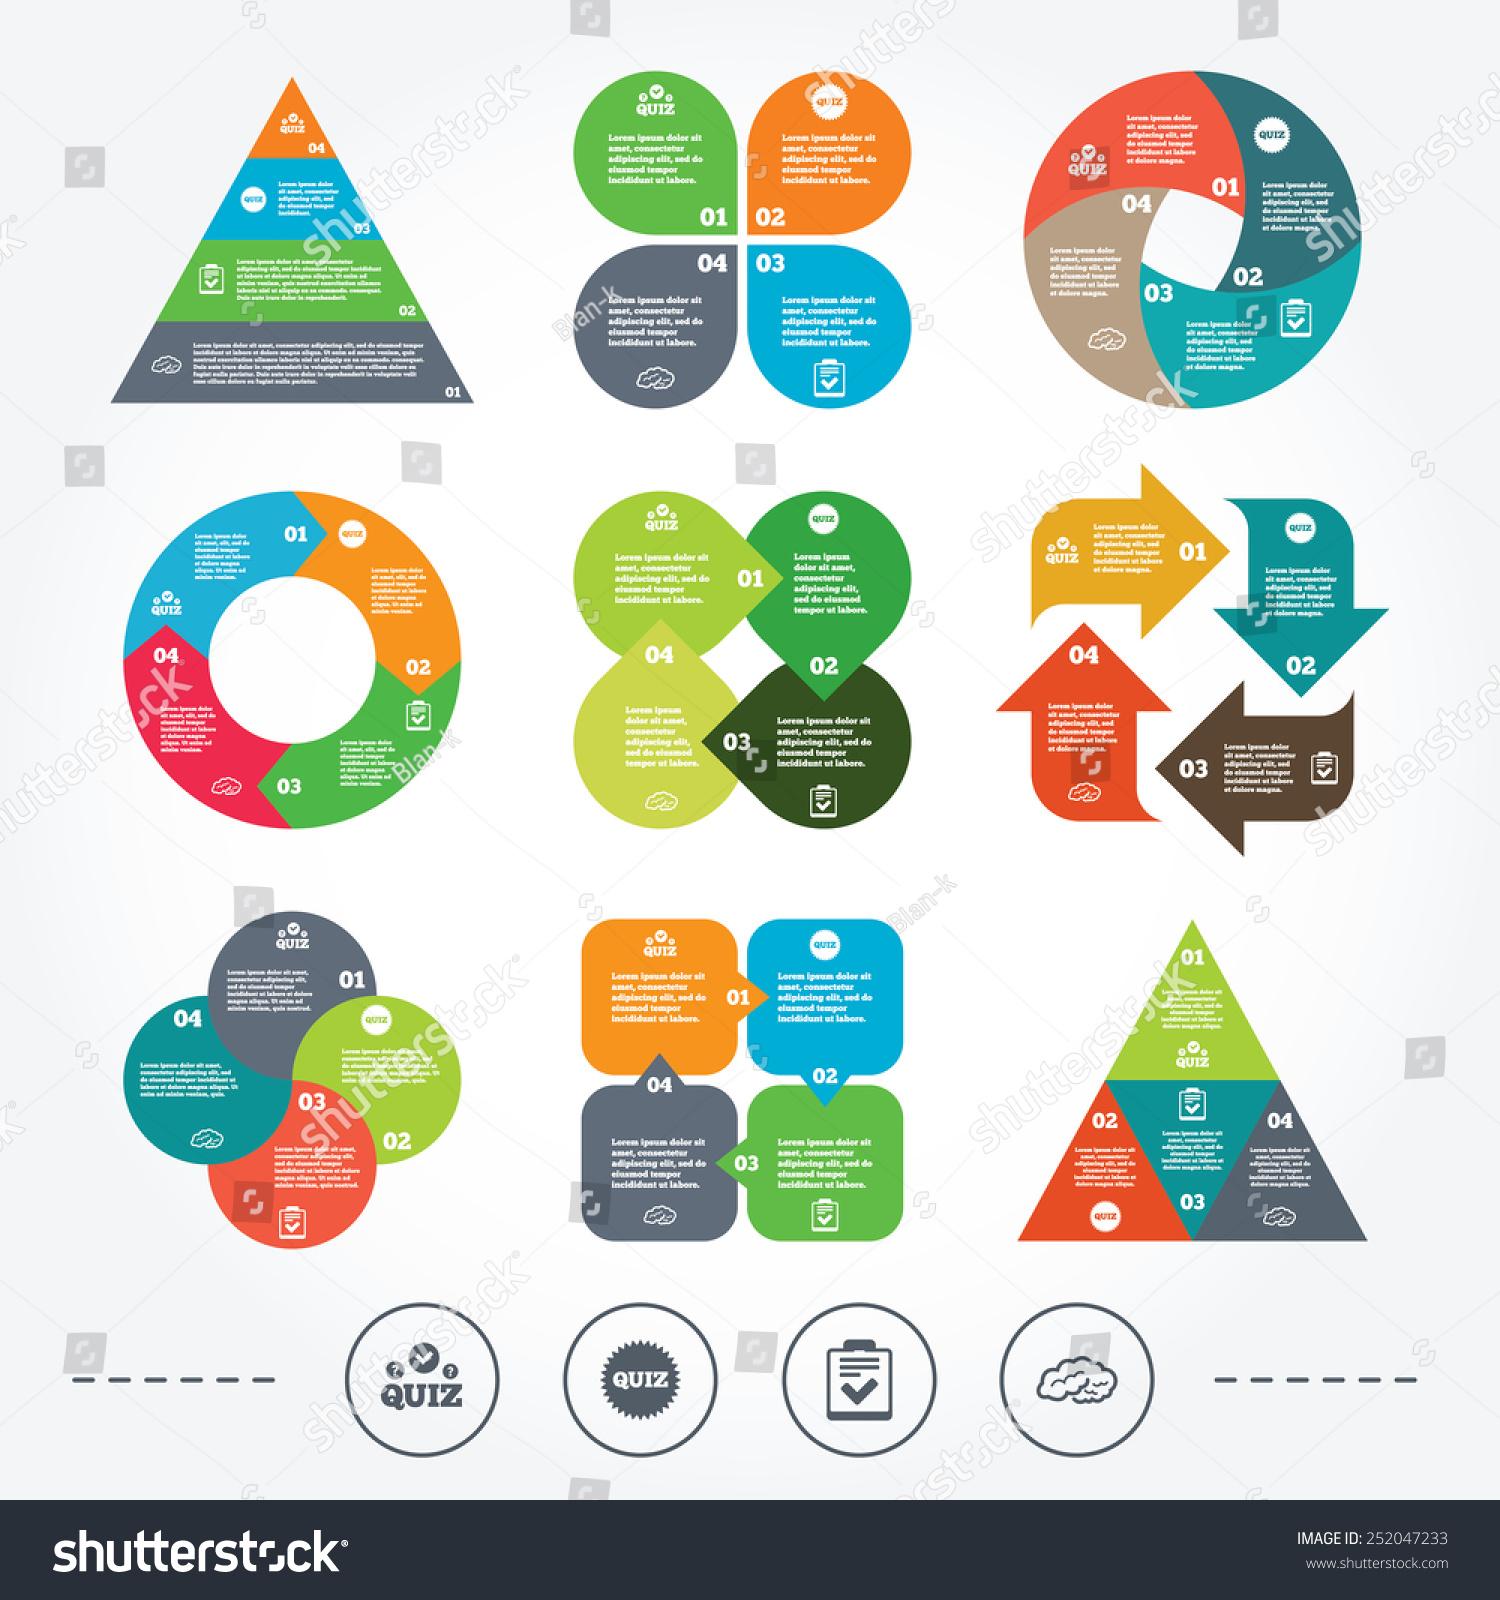 circle triangle diagram charts quiz icons stock vector  circle and triangle diagram charts quiz icons human brain think checklist symbol